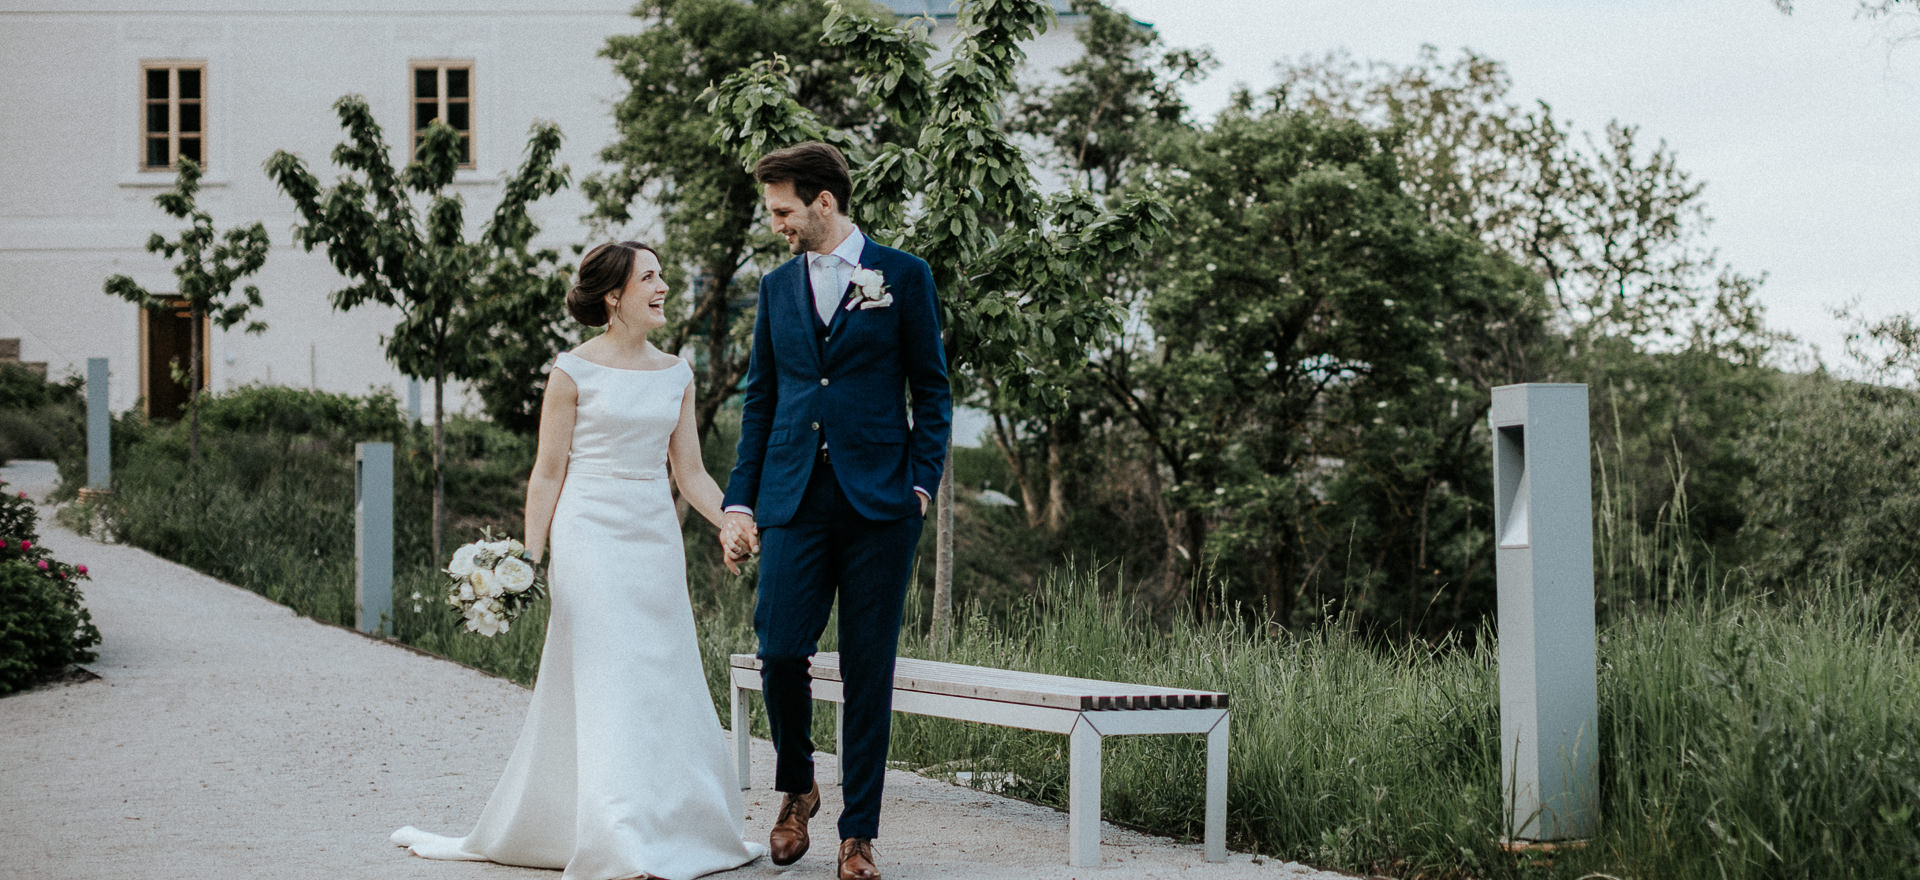 Brautpaarshooting Refugium Hochstrass